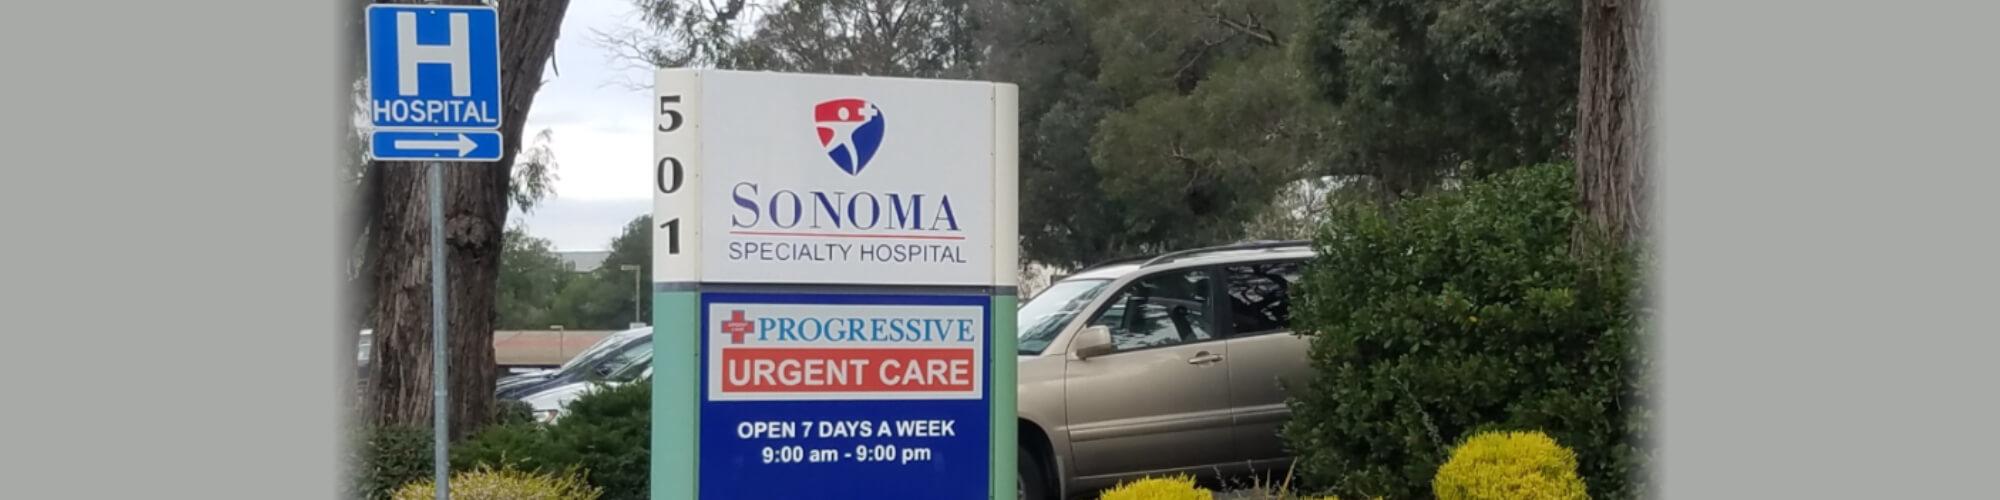 Progressive Urgent Care Opening Hours